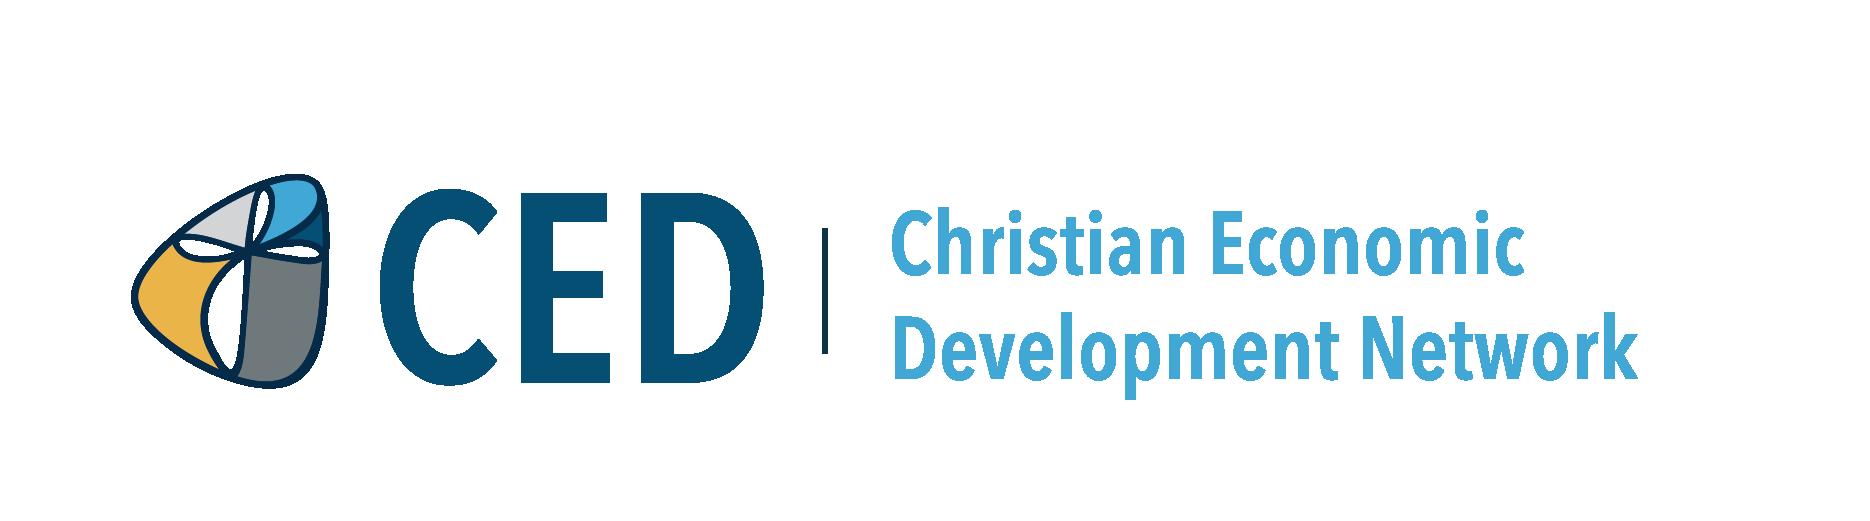 CED_Network_Descriptor.png